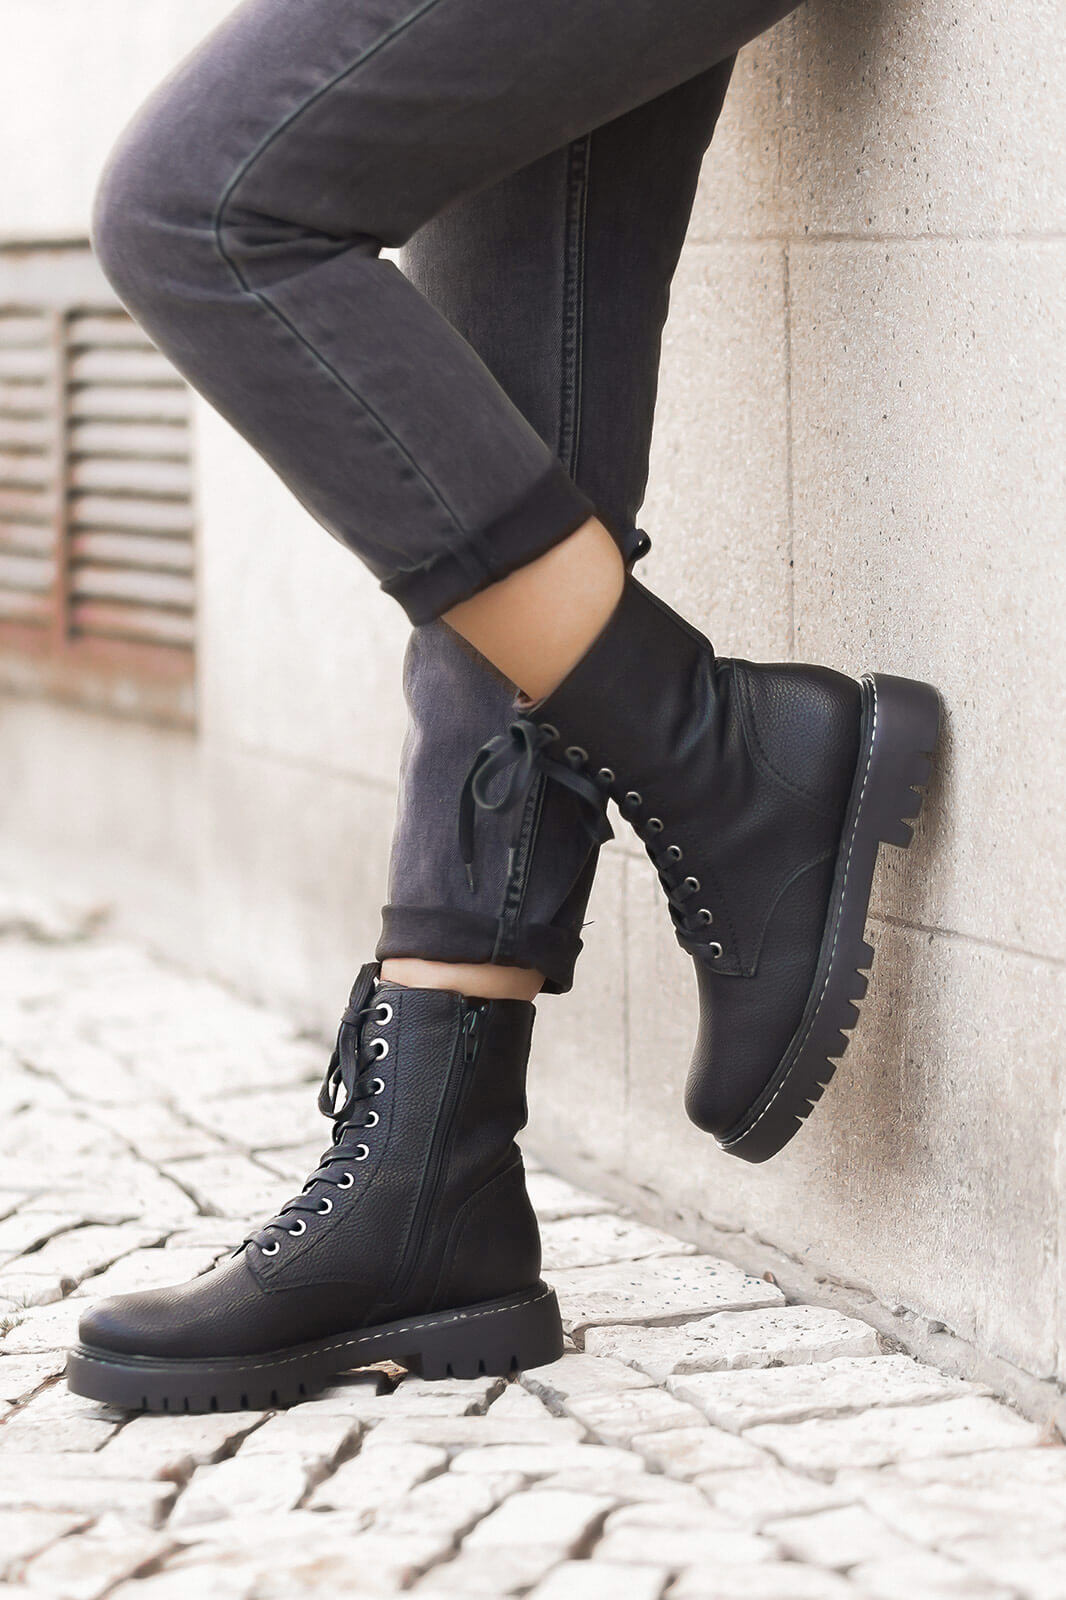 Chunky Boots stylen, Frühlingsoutfit mit Lederjacke, derbe Schnürboots, Shoelove by Deichmann